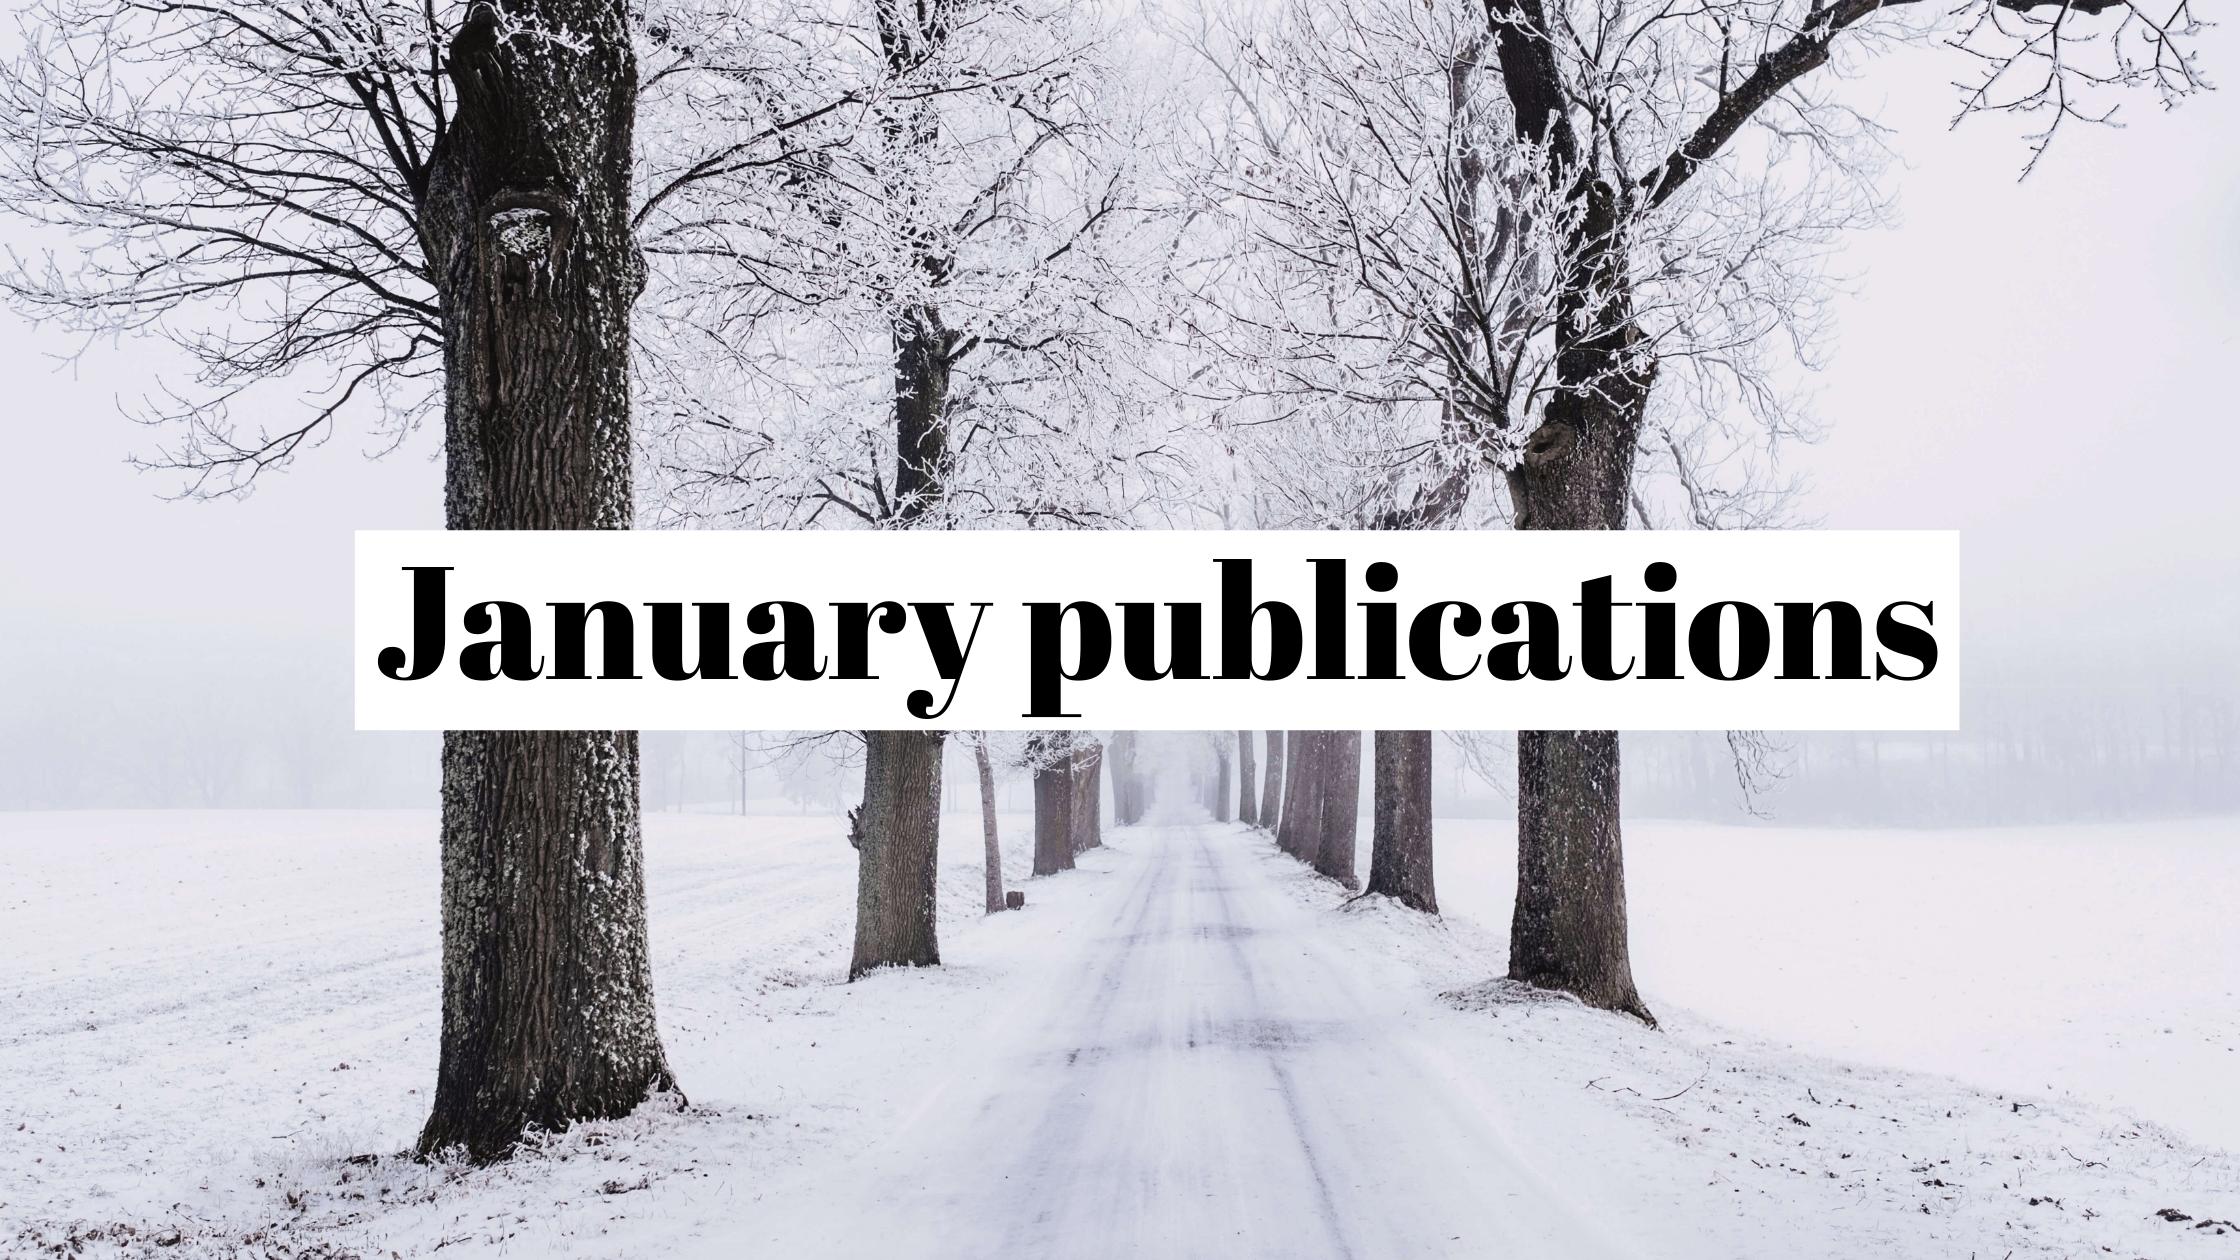 Truesix January 2021 publicity recap: a peaceful start to a brand new year